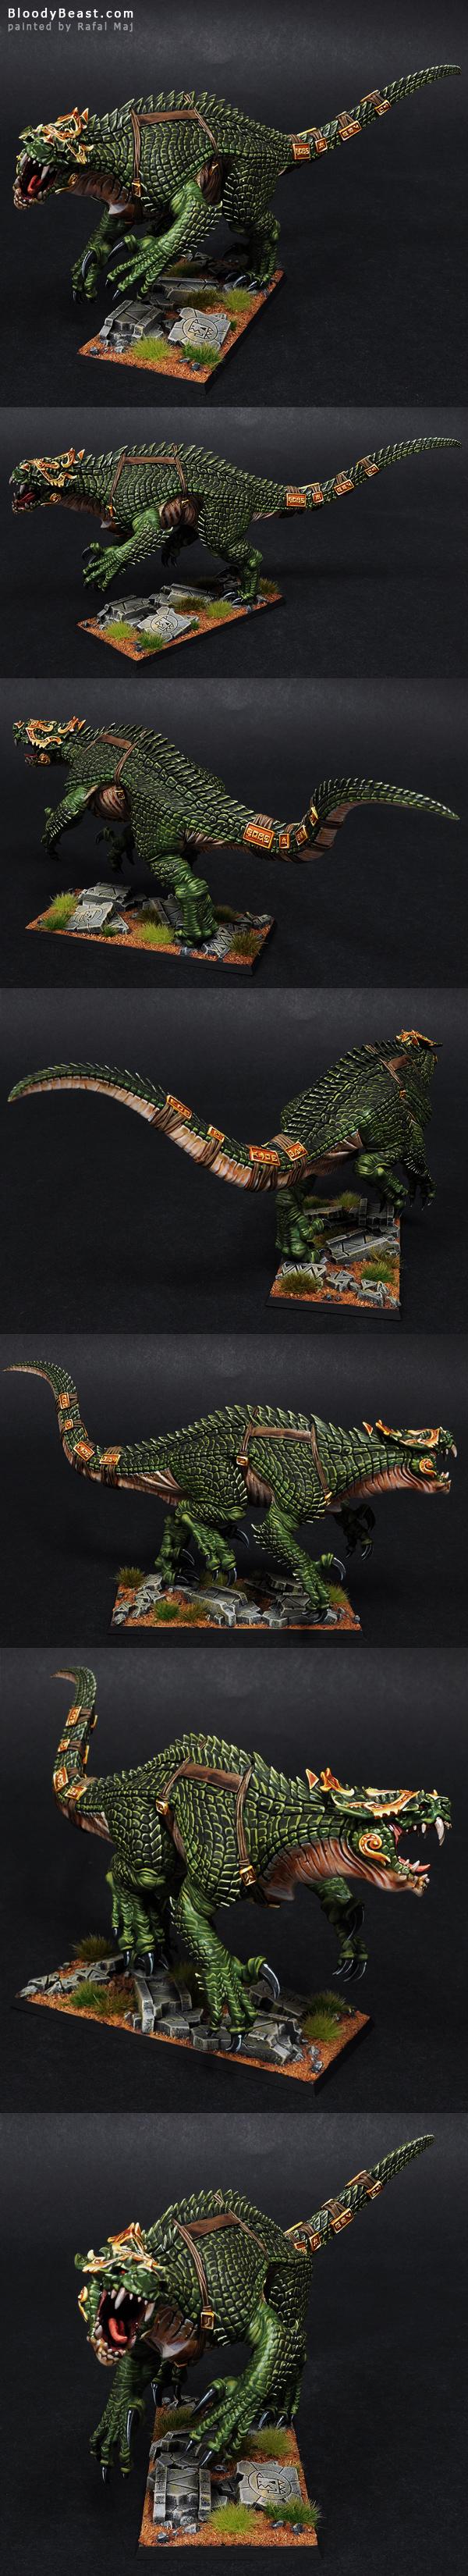 Lizardmen Carnosaur painted by Rafal Maj (BloodyBeast.com)